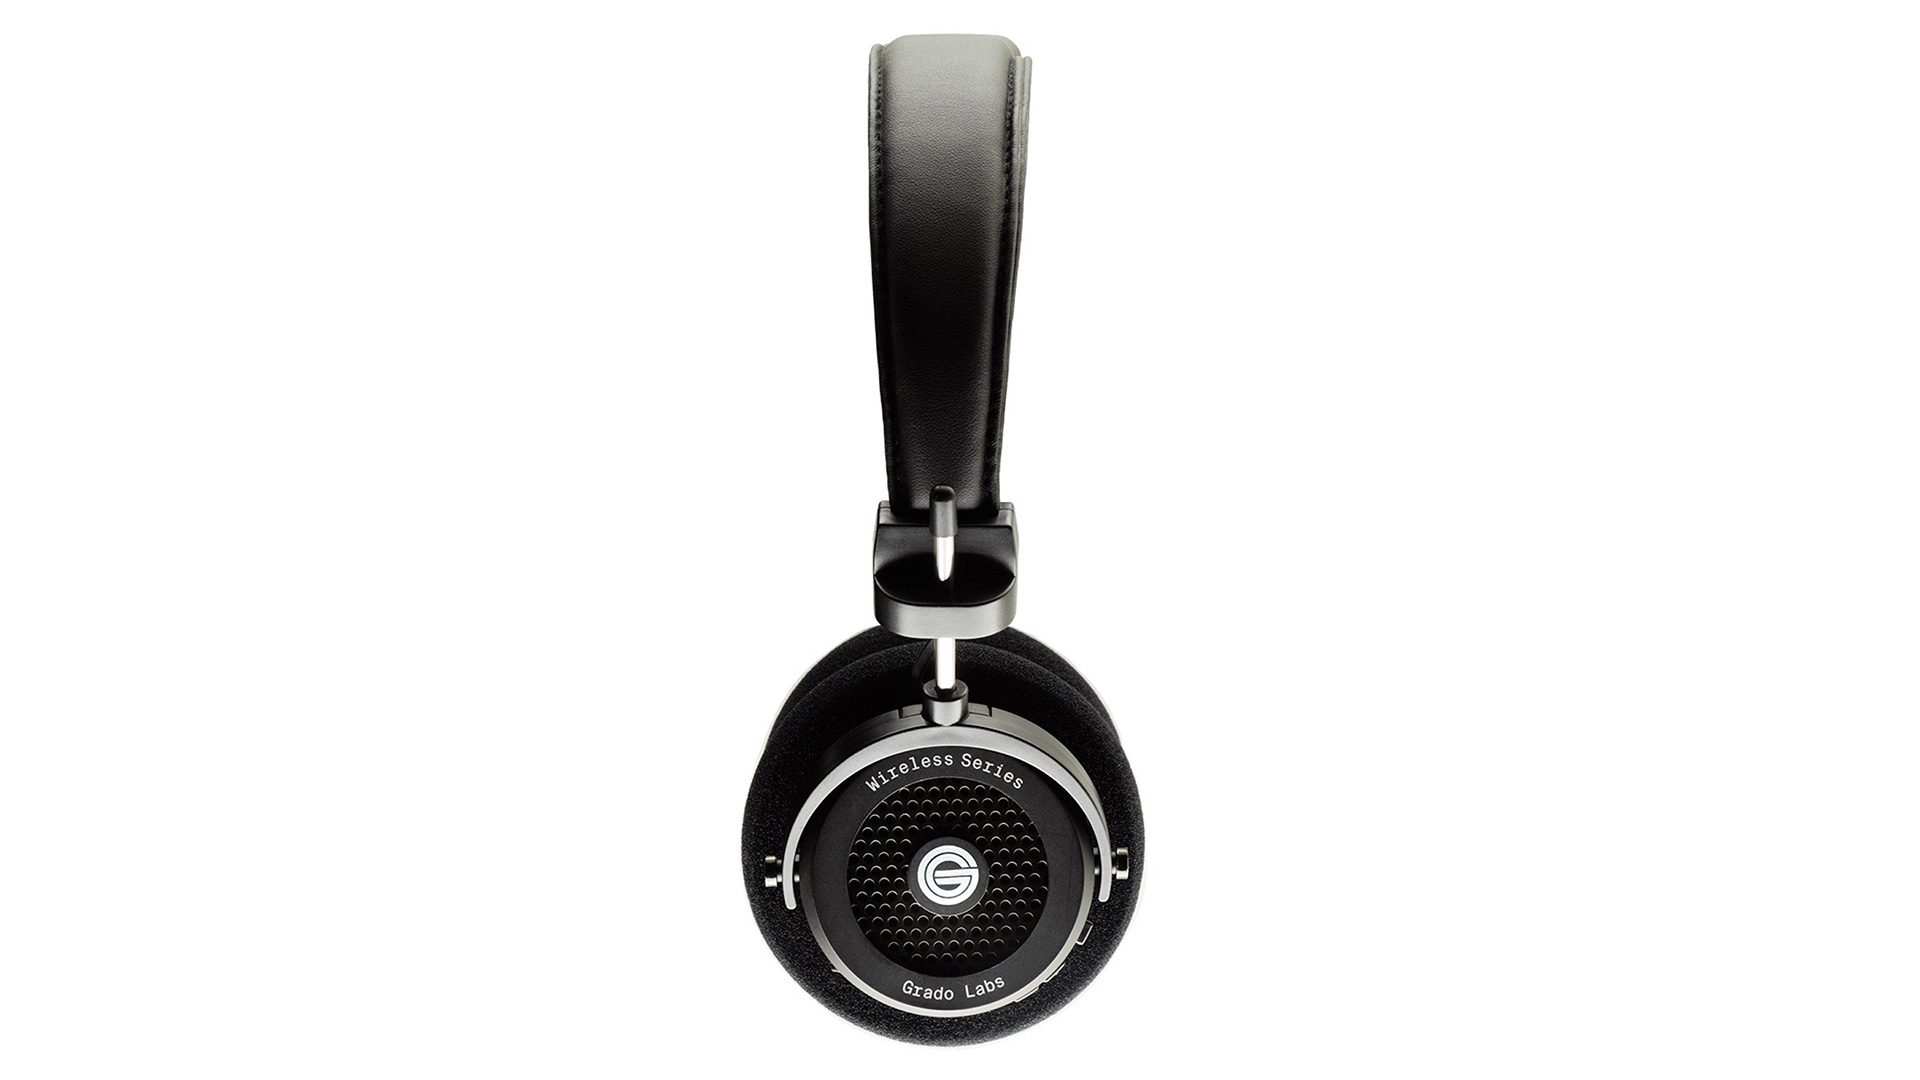 Grado GW100 Wireless Headphones (side view) in Winnipeg at Creative Audio